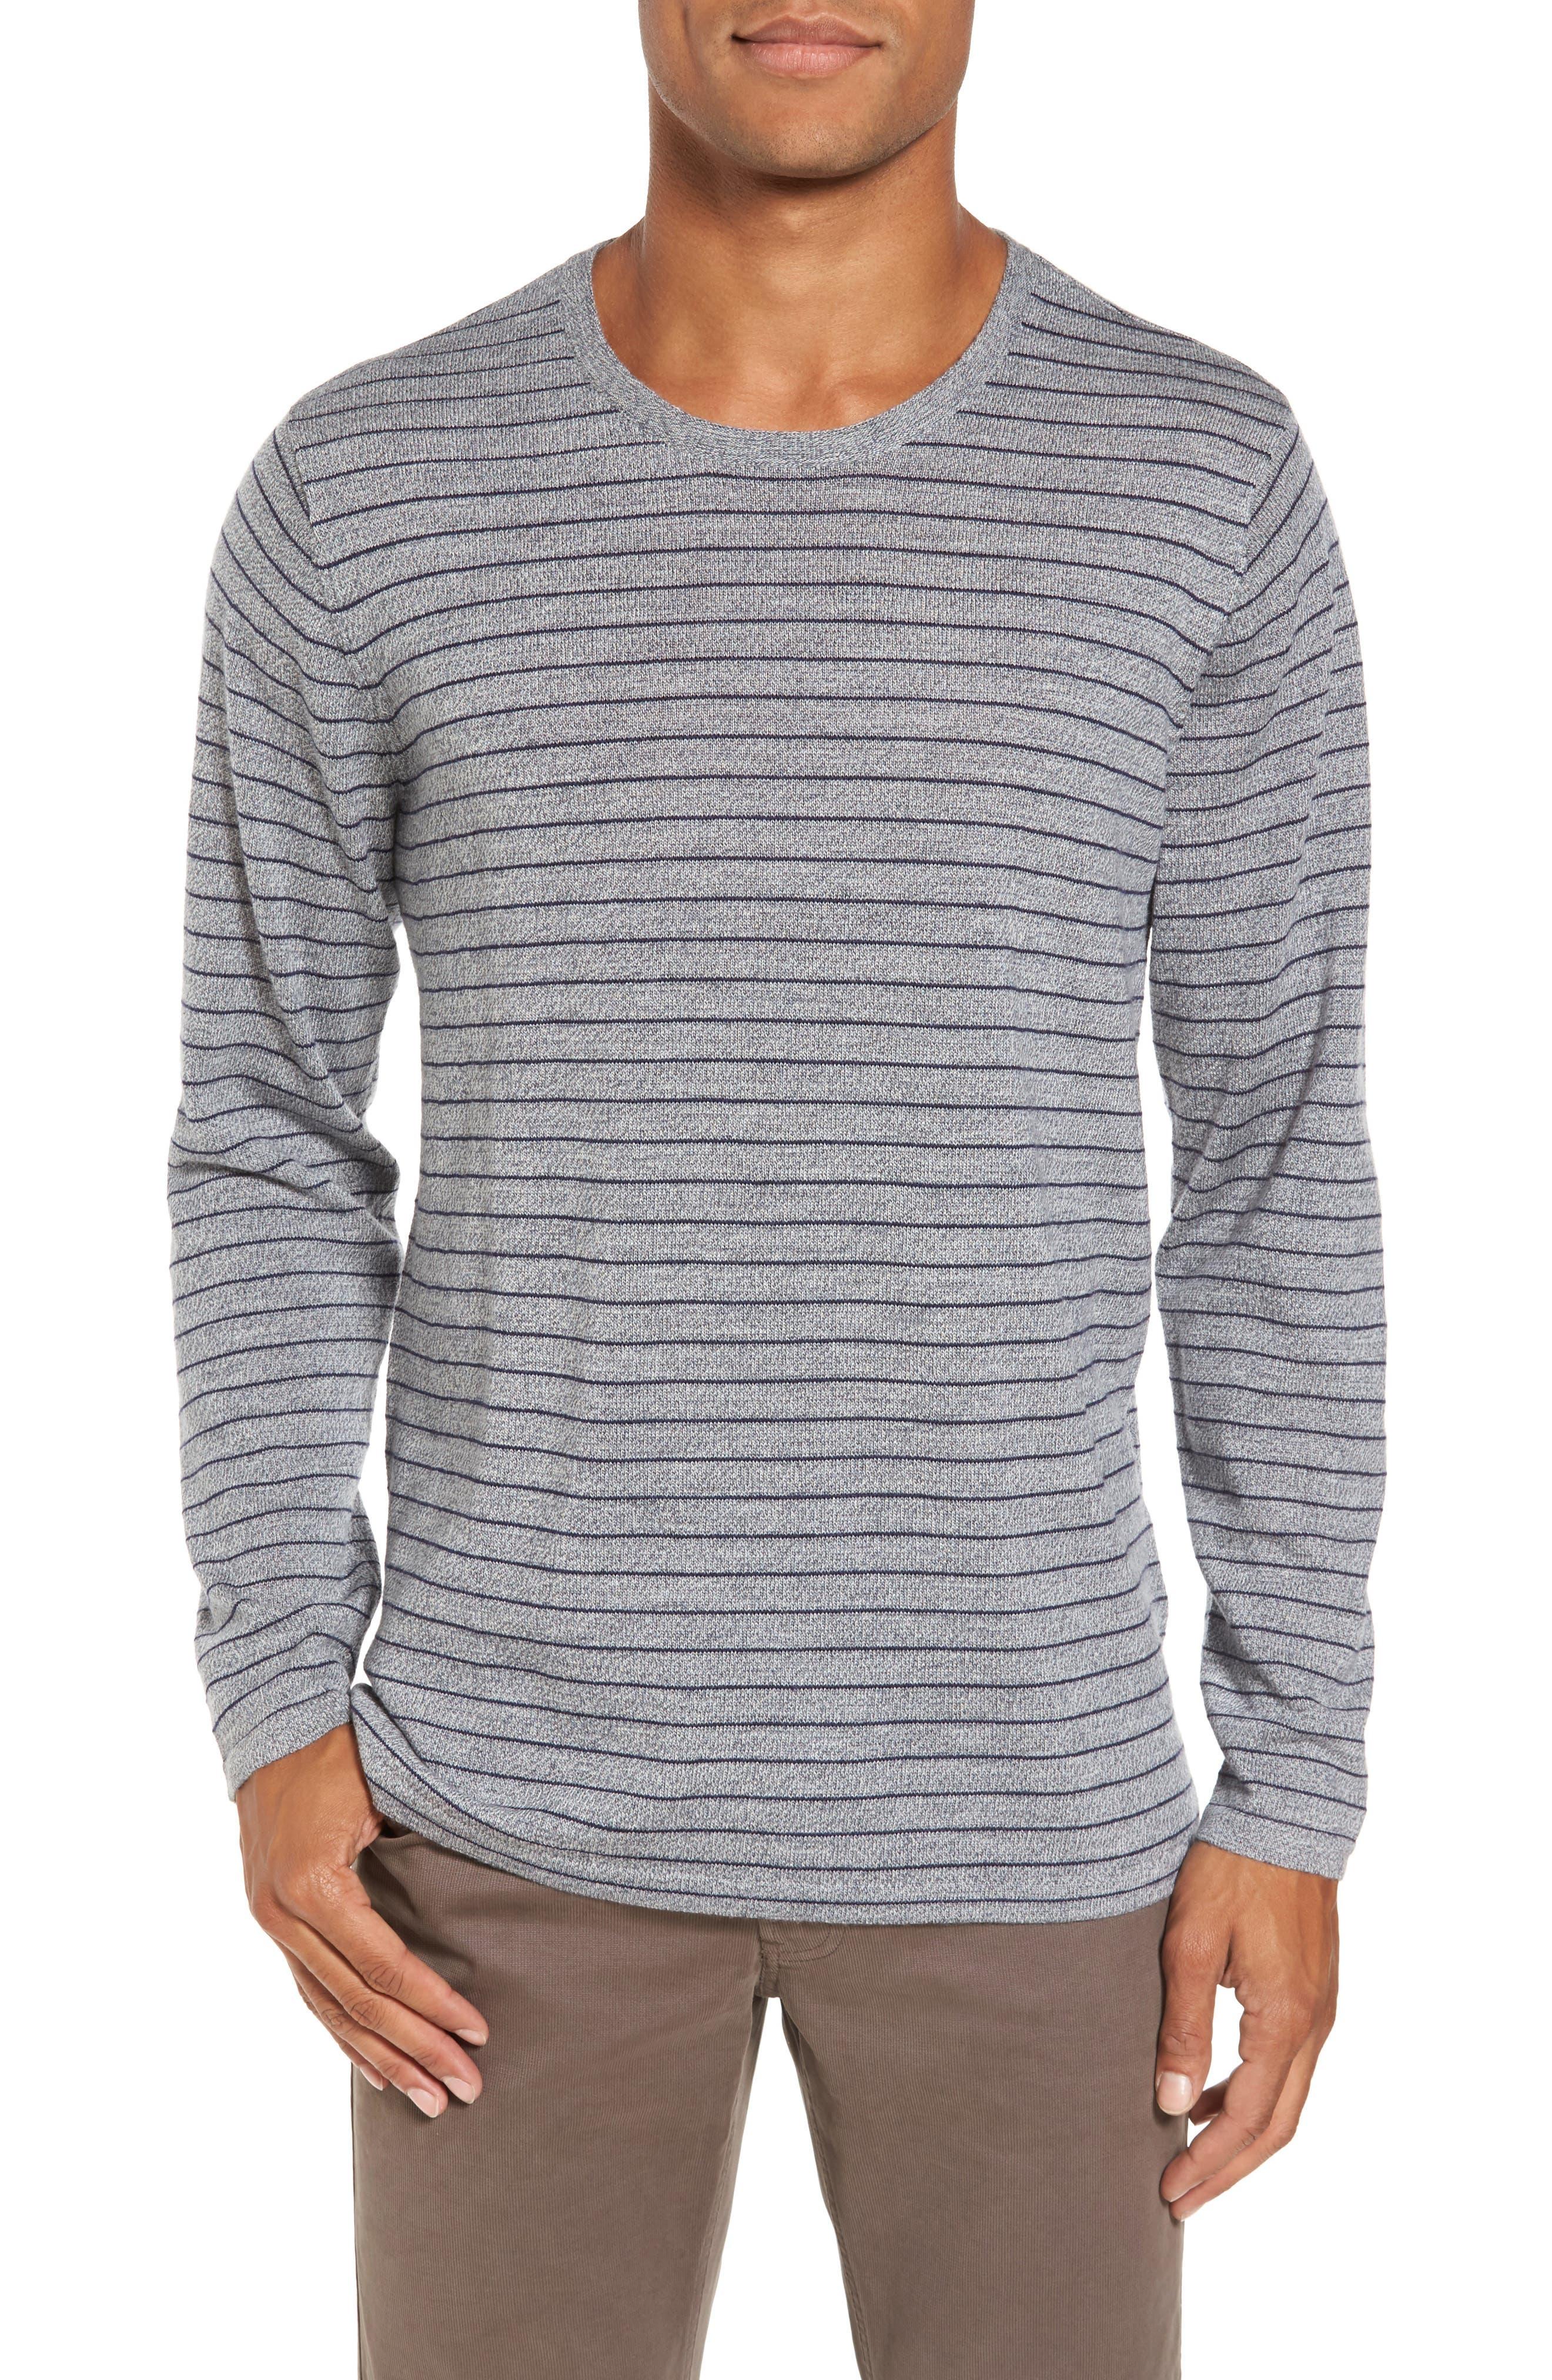 Nori Stripe Merino Wool T-Shirt,                             Main thumbnail 1, color,                             Heather Ink